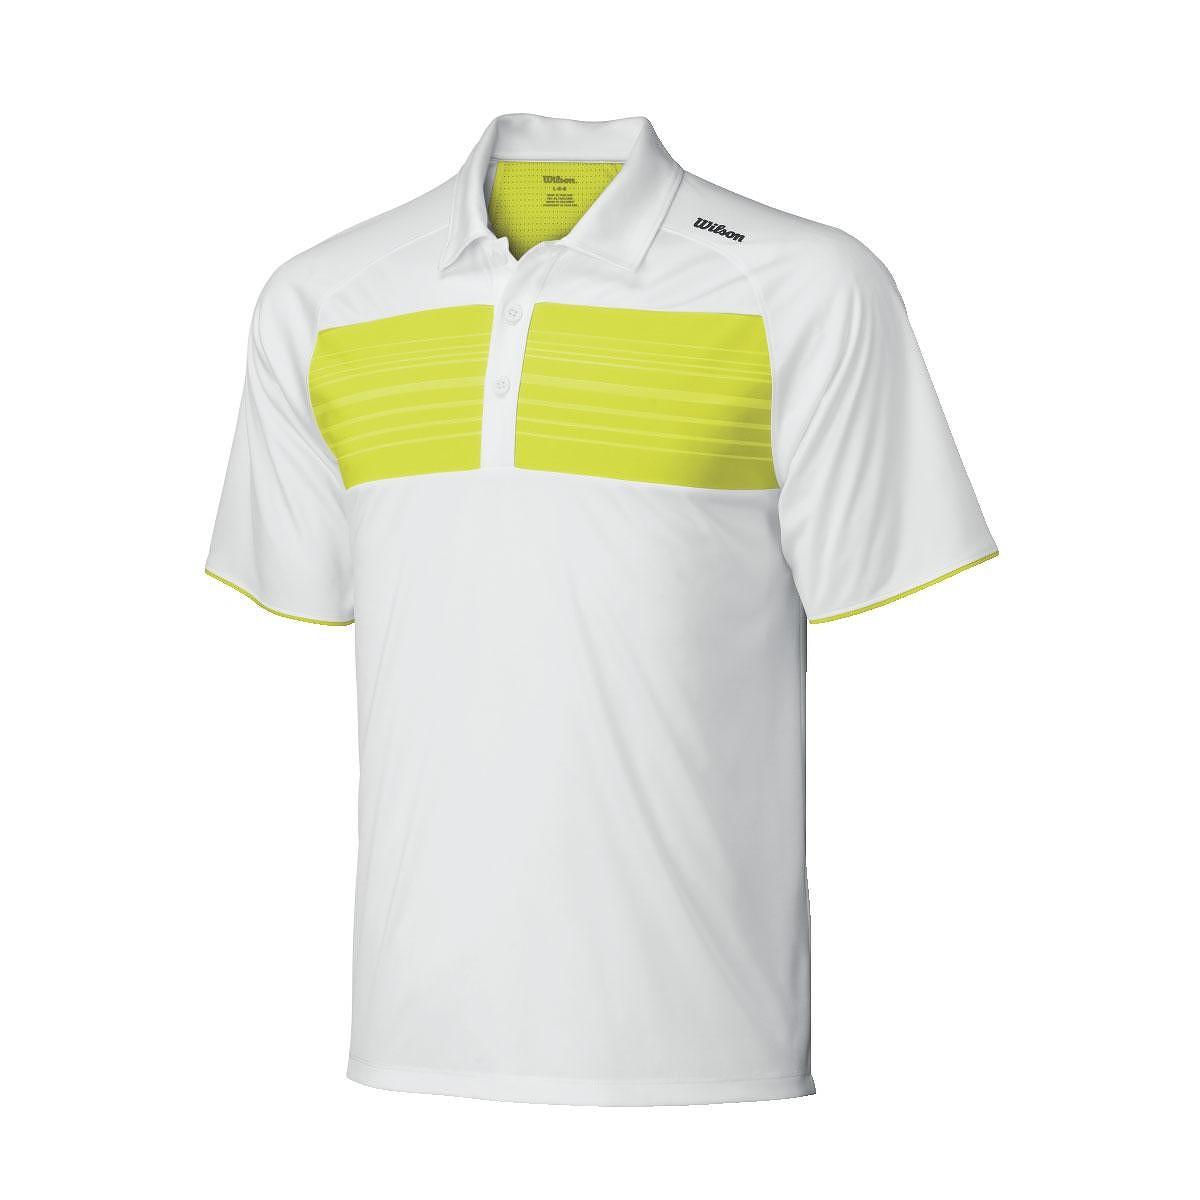 Áo Tennis Wilson MEN'S EXPLOSIVE POLO - WRA 141201